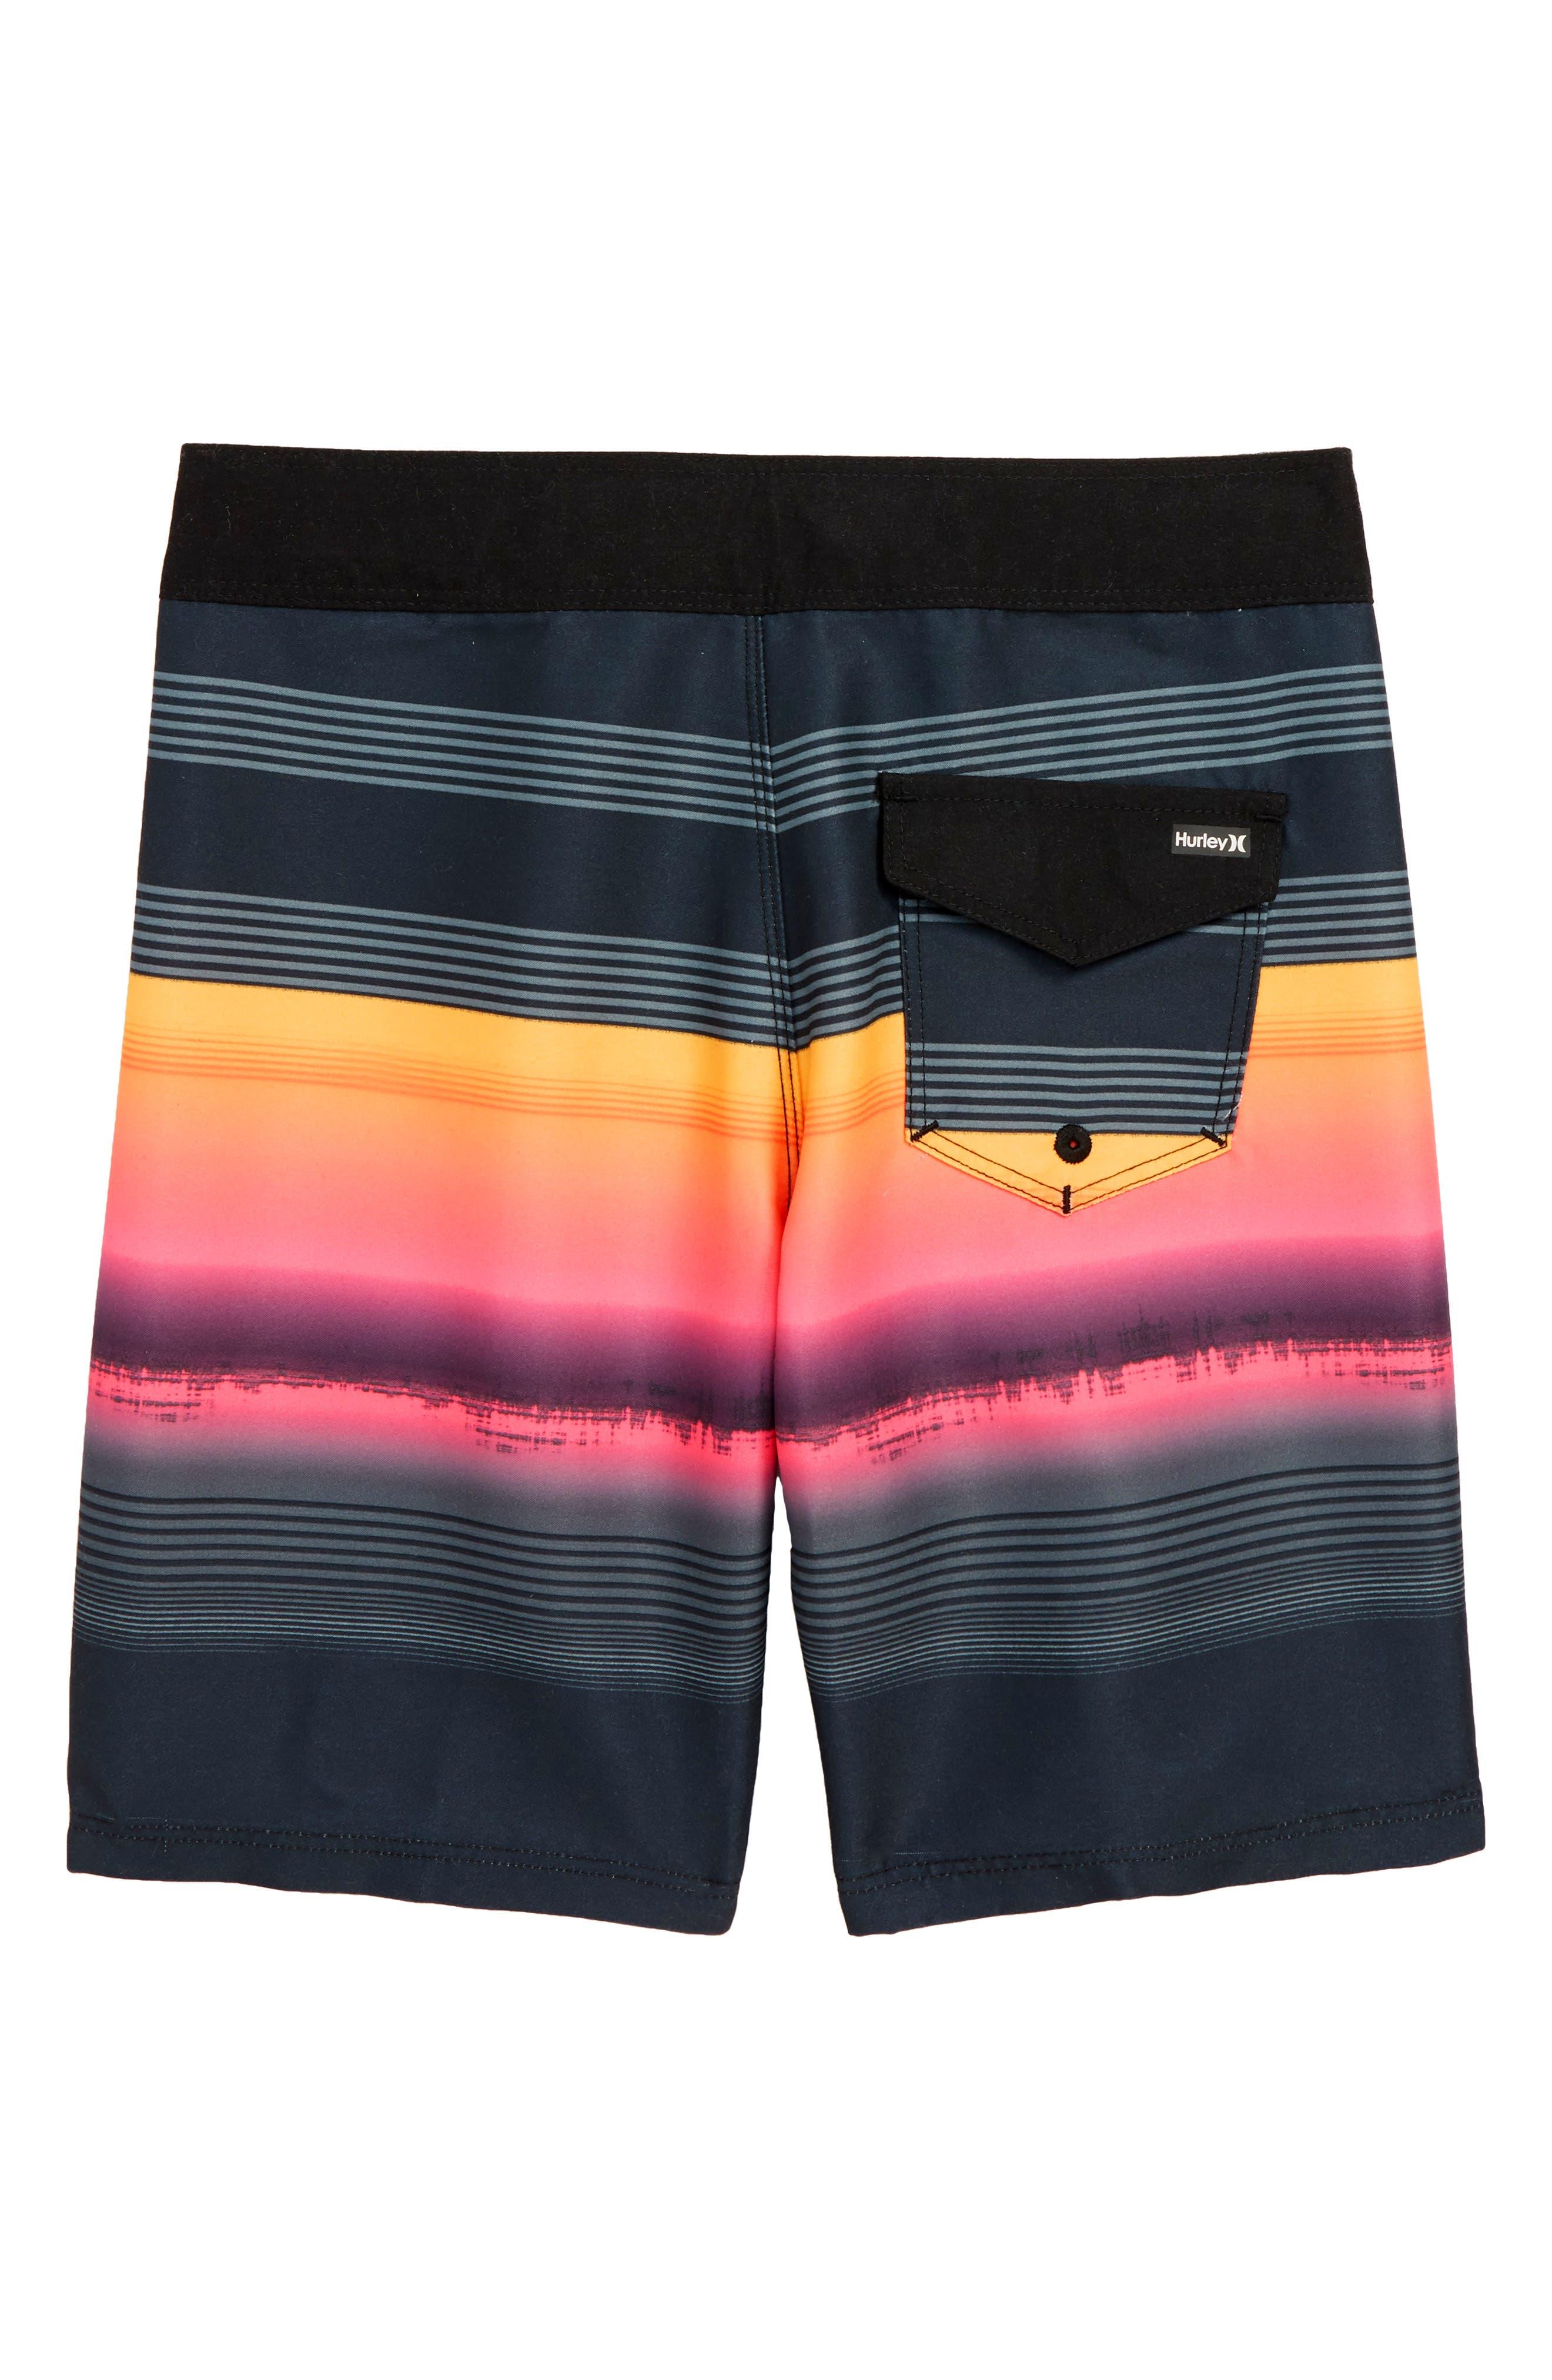 Gavitos Board Shorts,                             Alternate thumbnail 2, color,                             Black